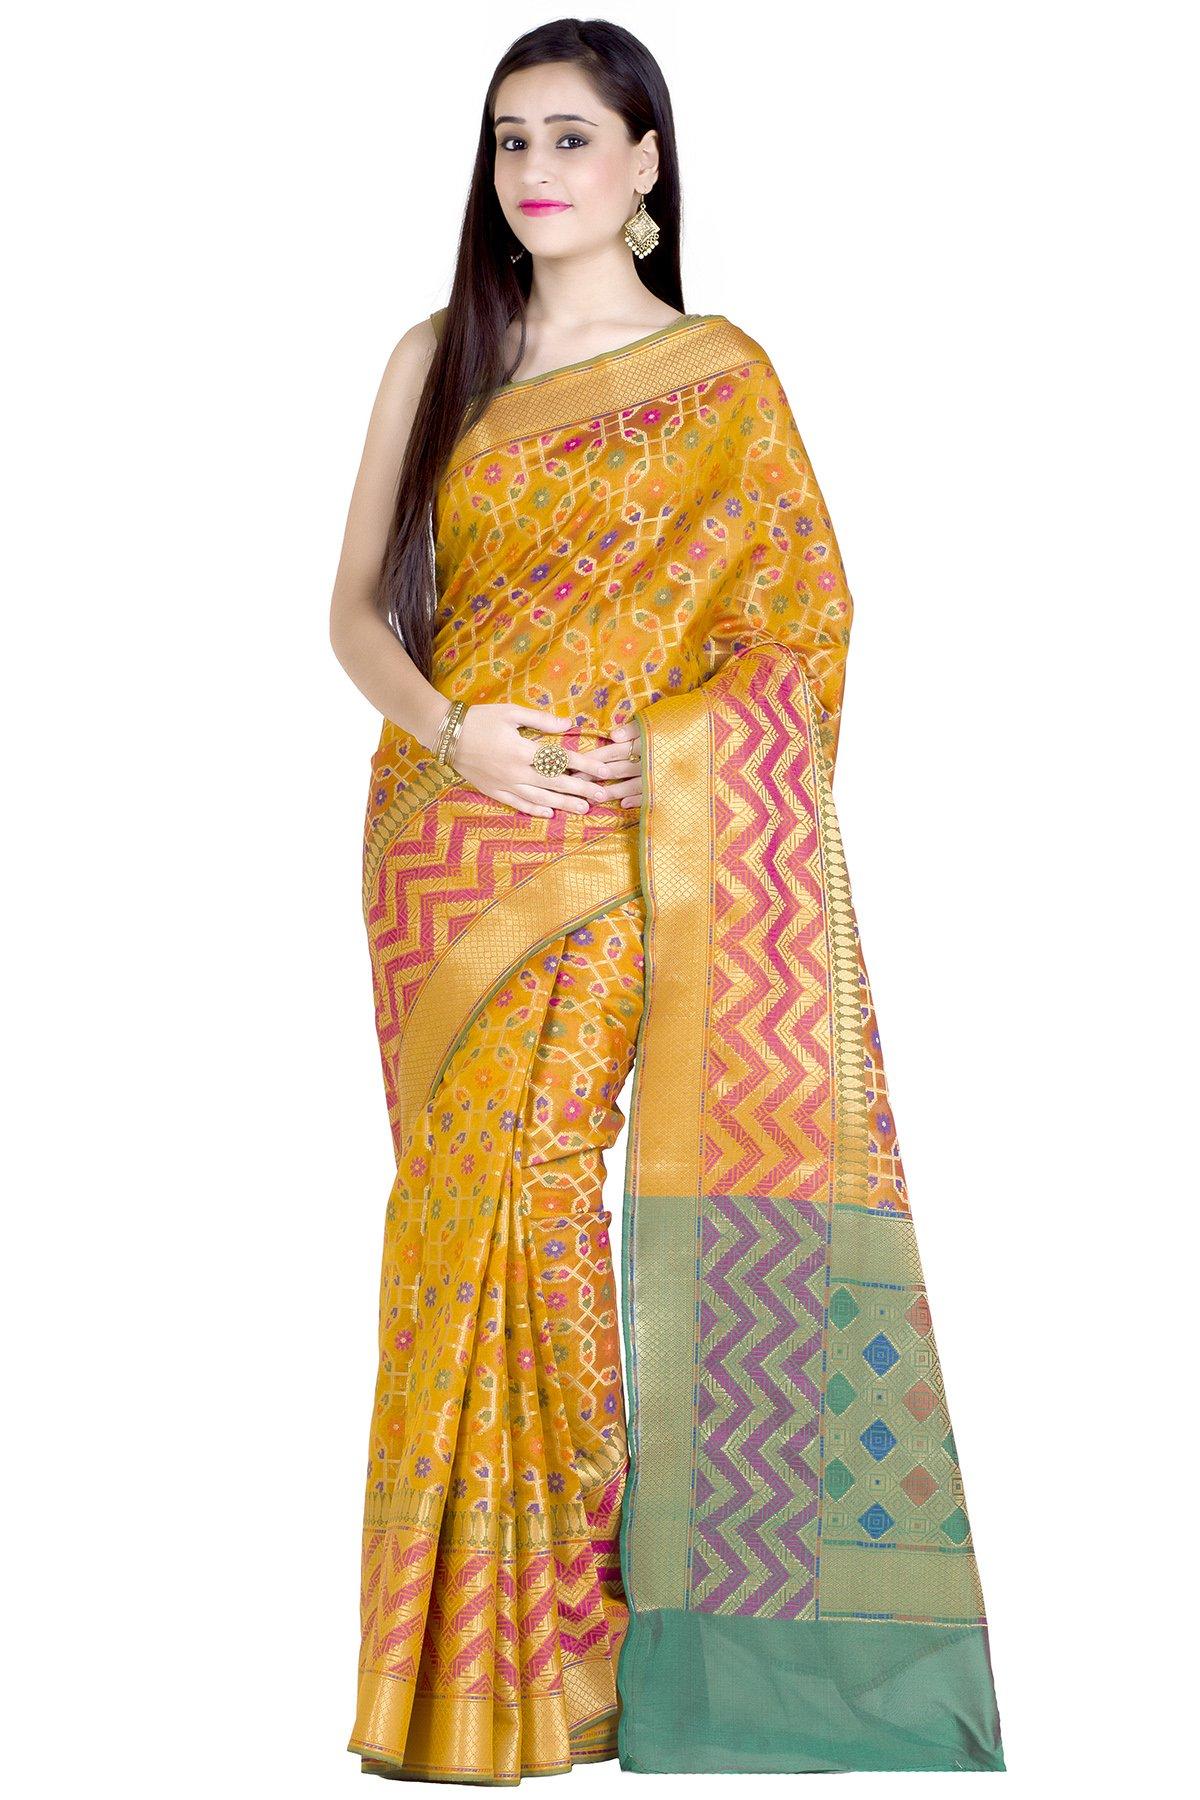 Chandrakala Women's Gold Cotton Silk Banarasi Saree(1242GOL)